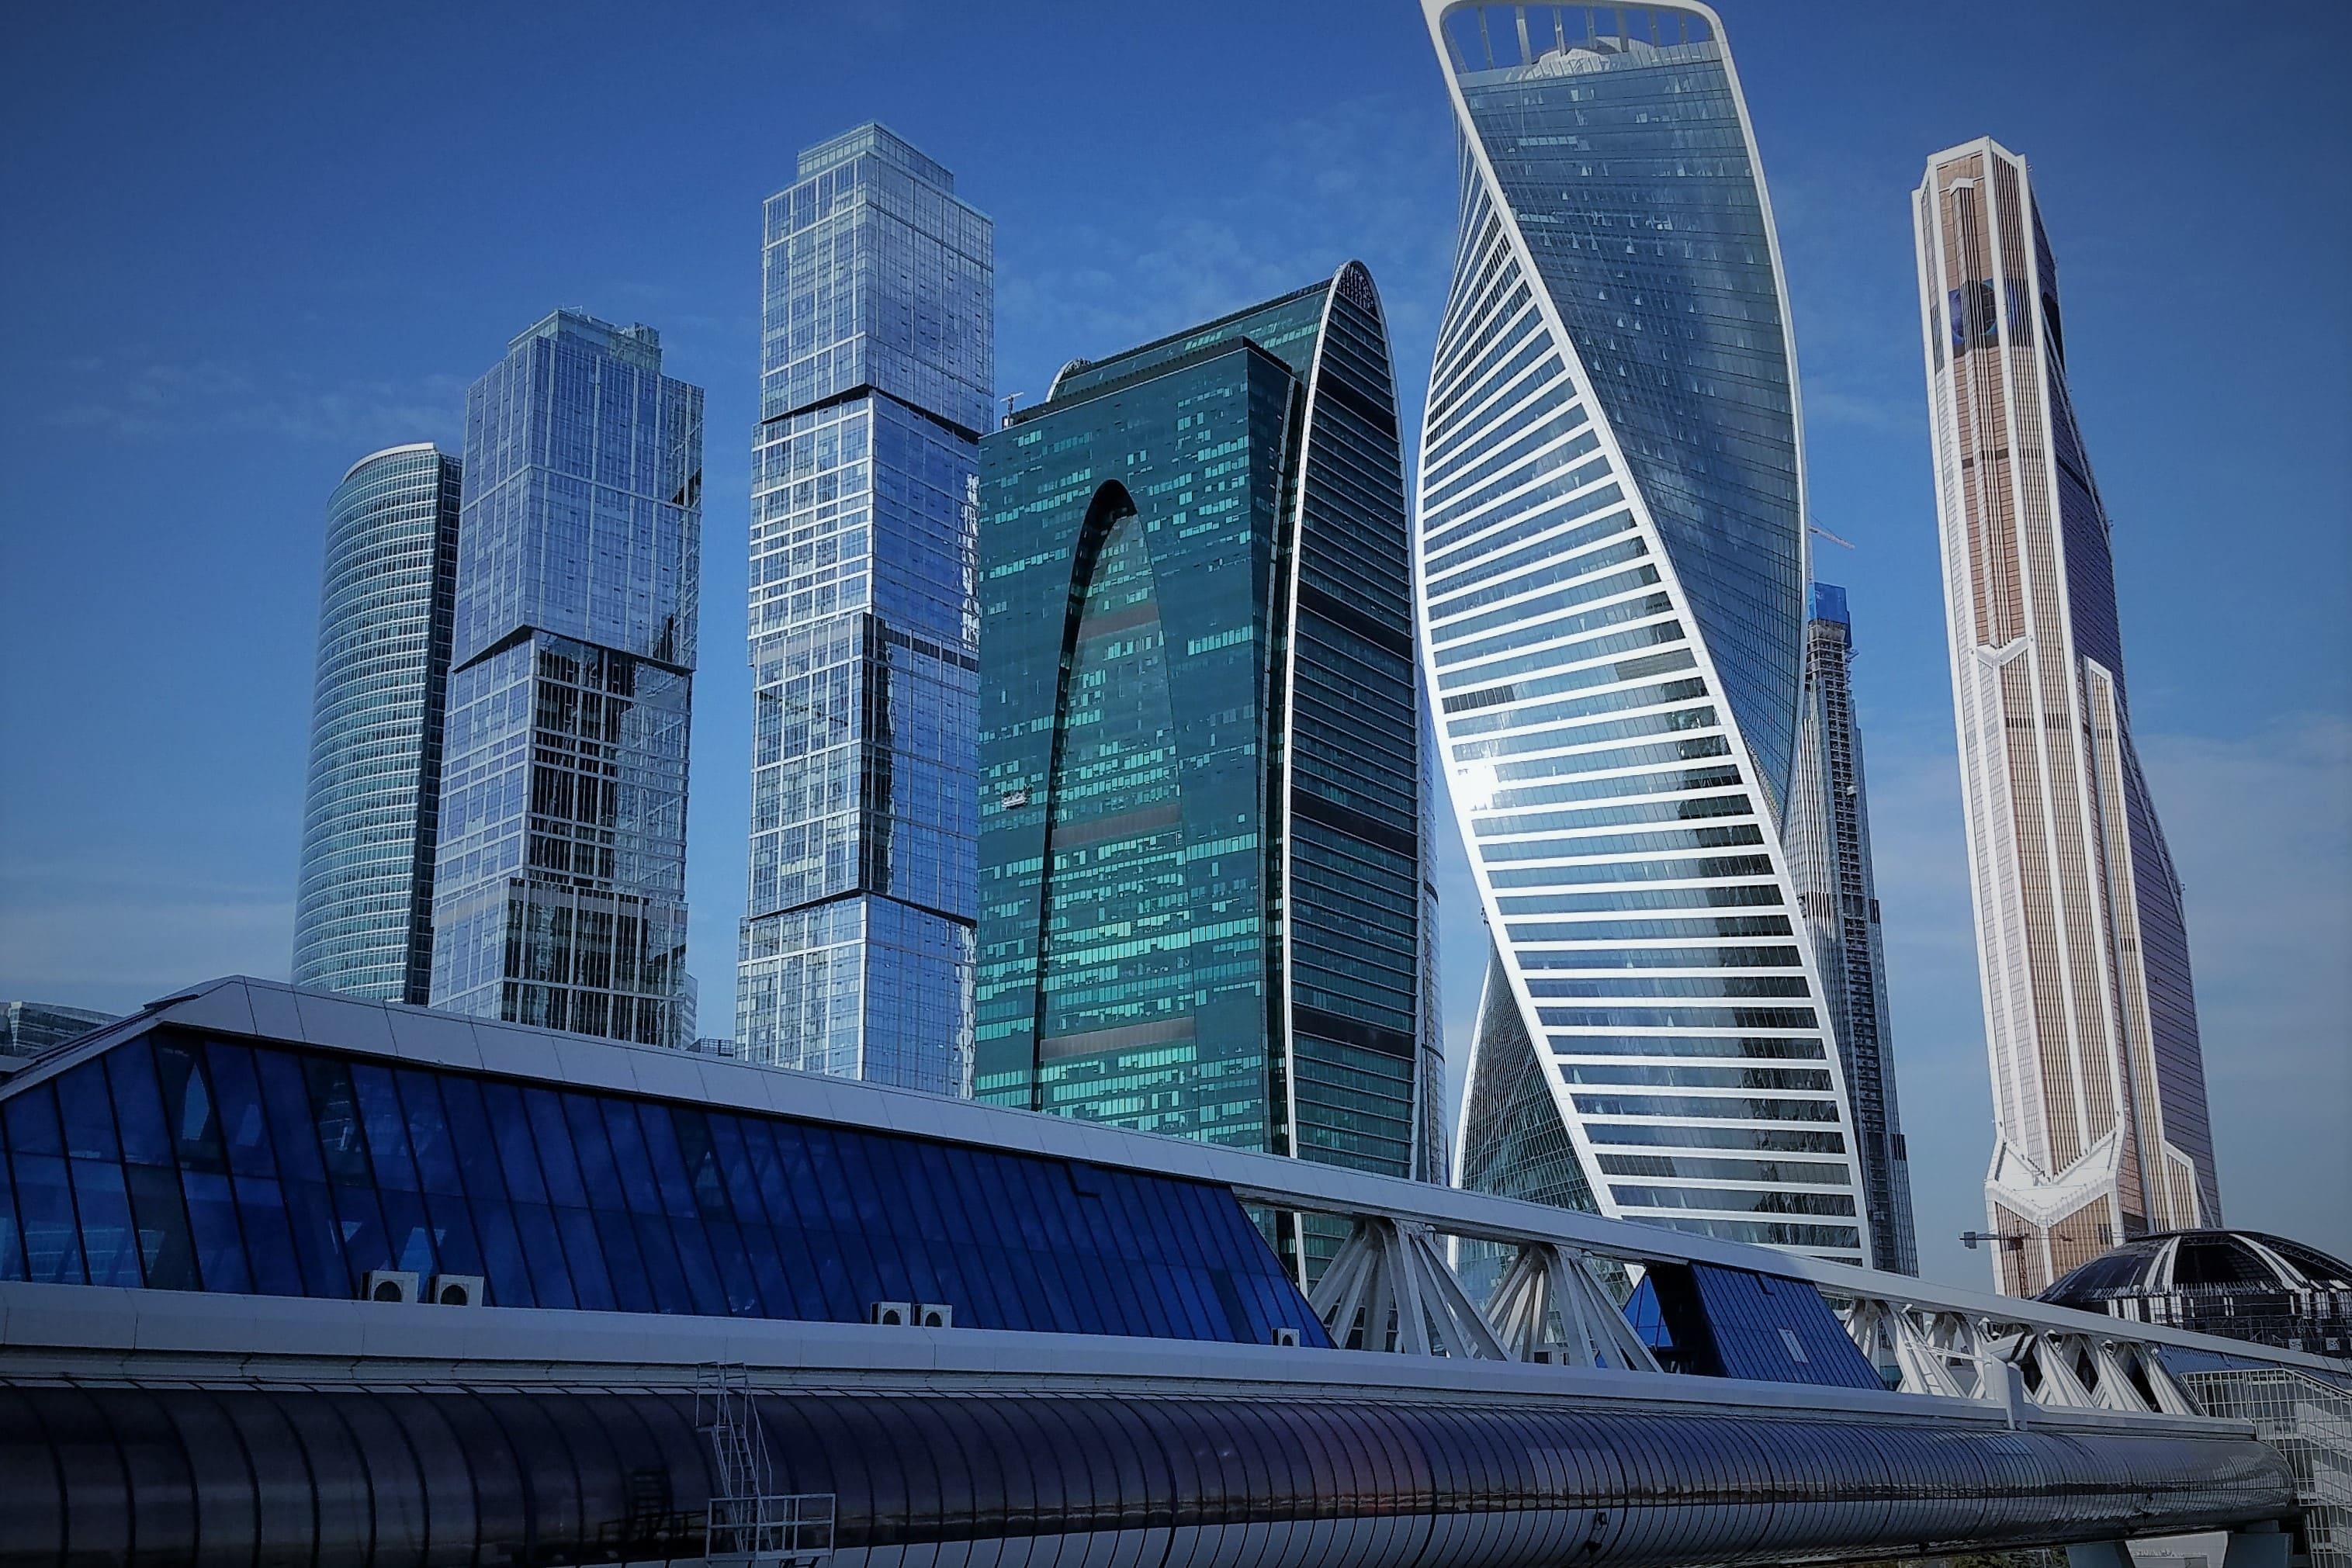 Аренда офисов Москва Сити башня Империя